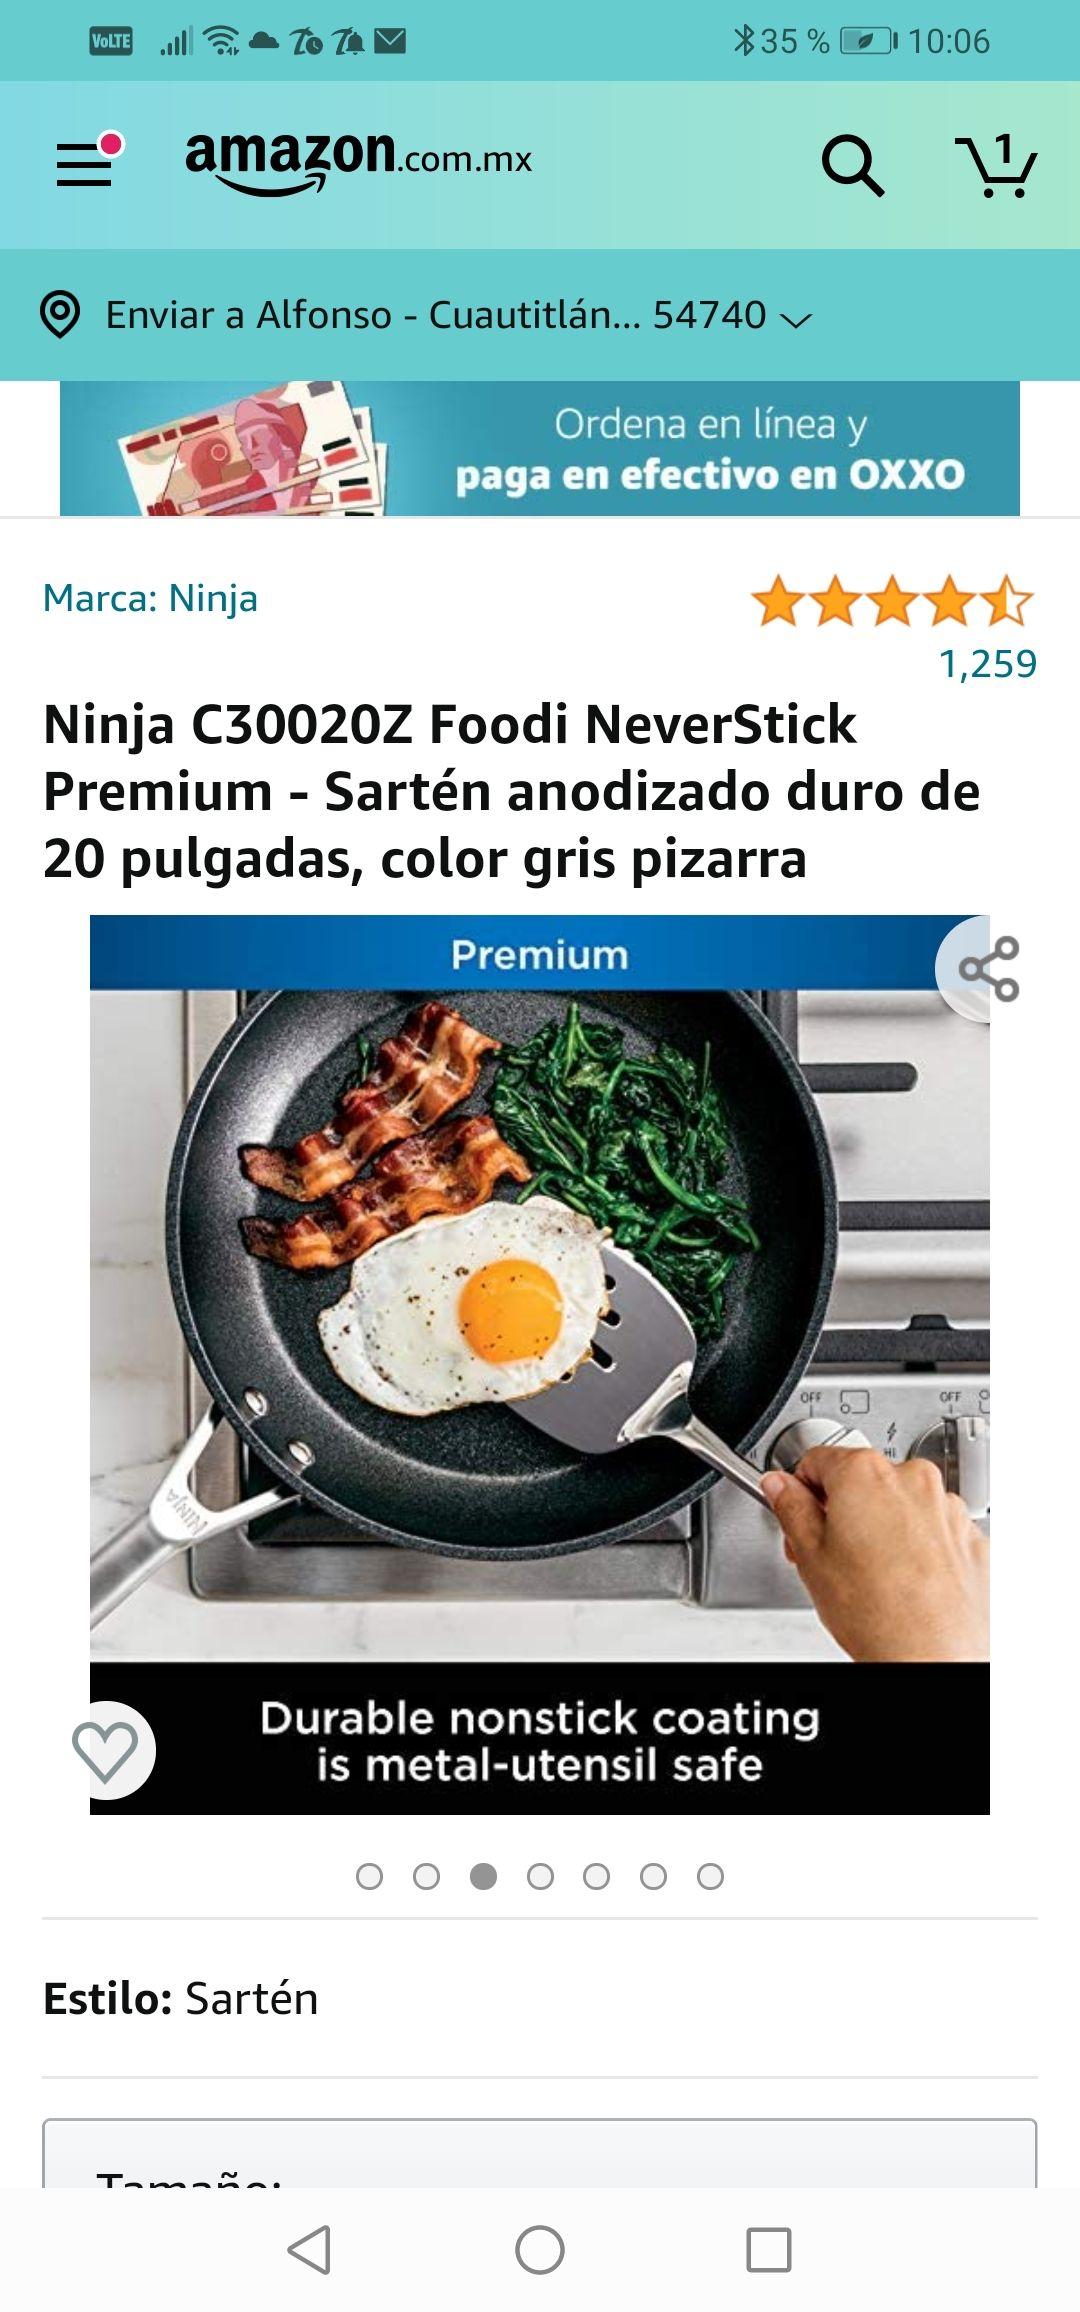 Amazon: Ninja C30020Z Foodi NeverStick Premium - Sartén anodizado duro de 20 pulgadas, color gris pizarra